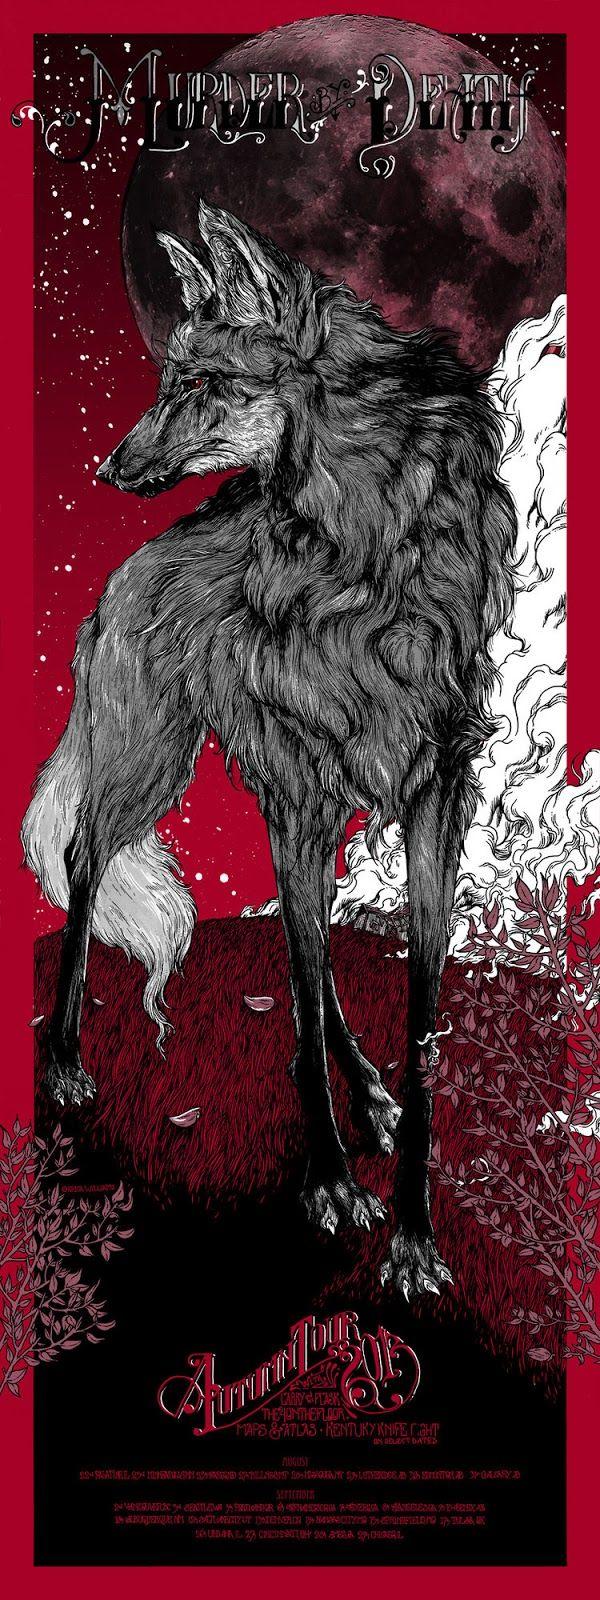 Murder by Death - Erica Williams - 2013 ----